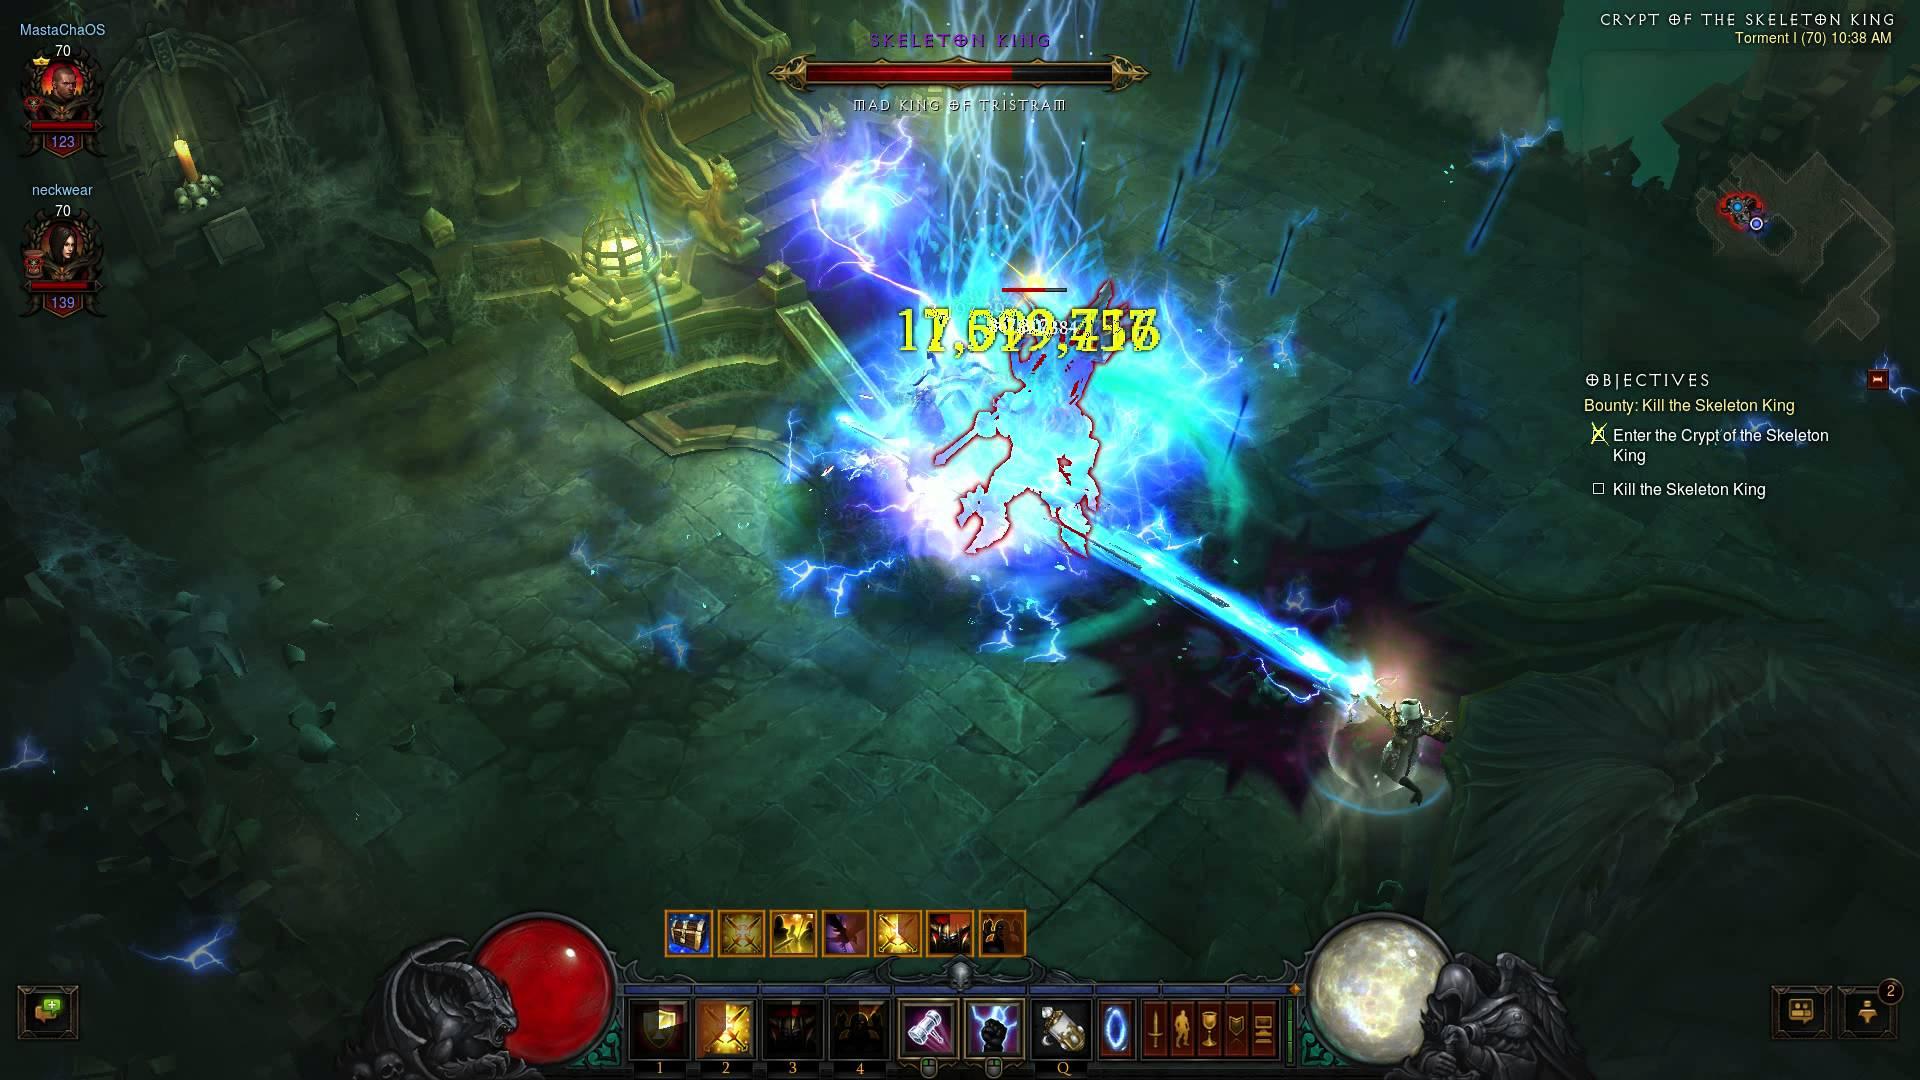 Diablo III – Leoric the Skeleton King